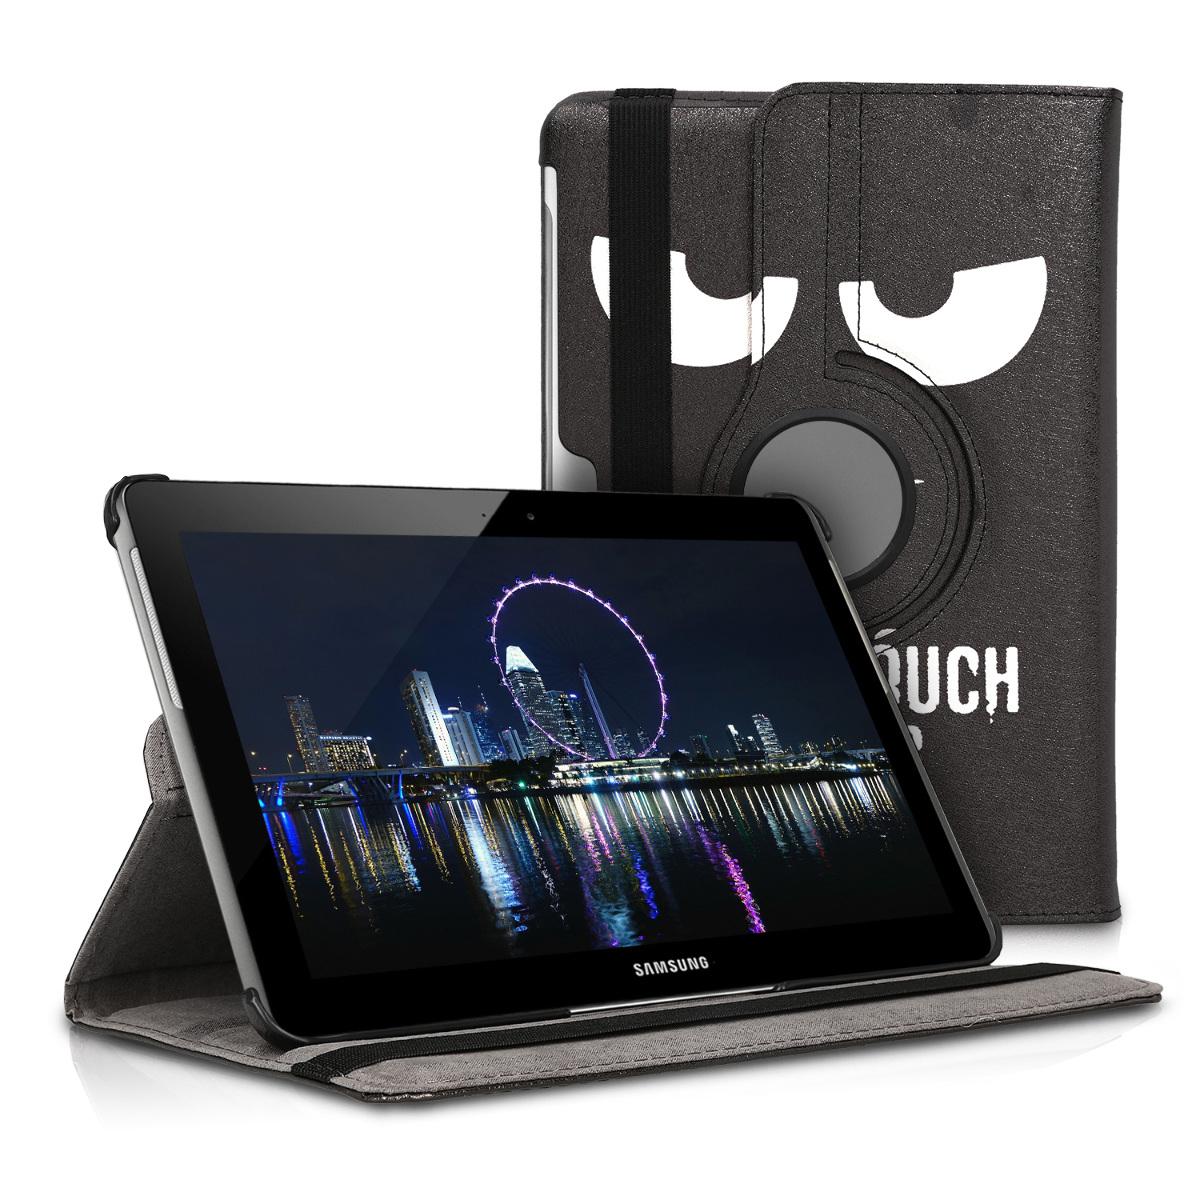 KW Θήκη 360° Samsung Galaxy Tab 2 10.1 P5100/P5110 - Συνθετικό Δέρμα - White / Black (44714.01)